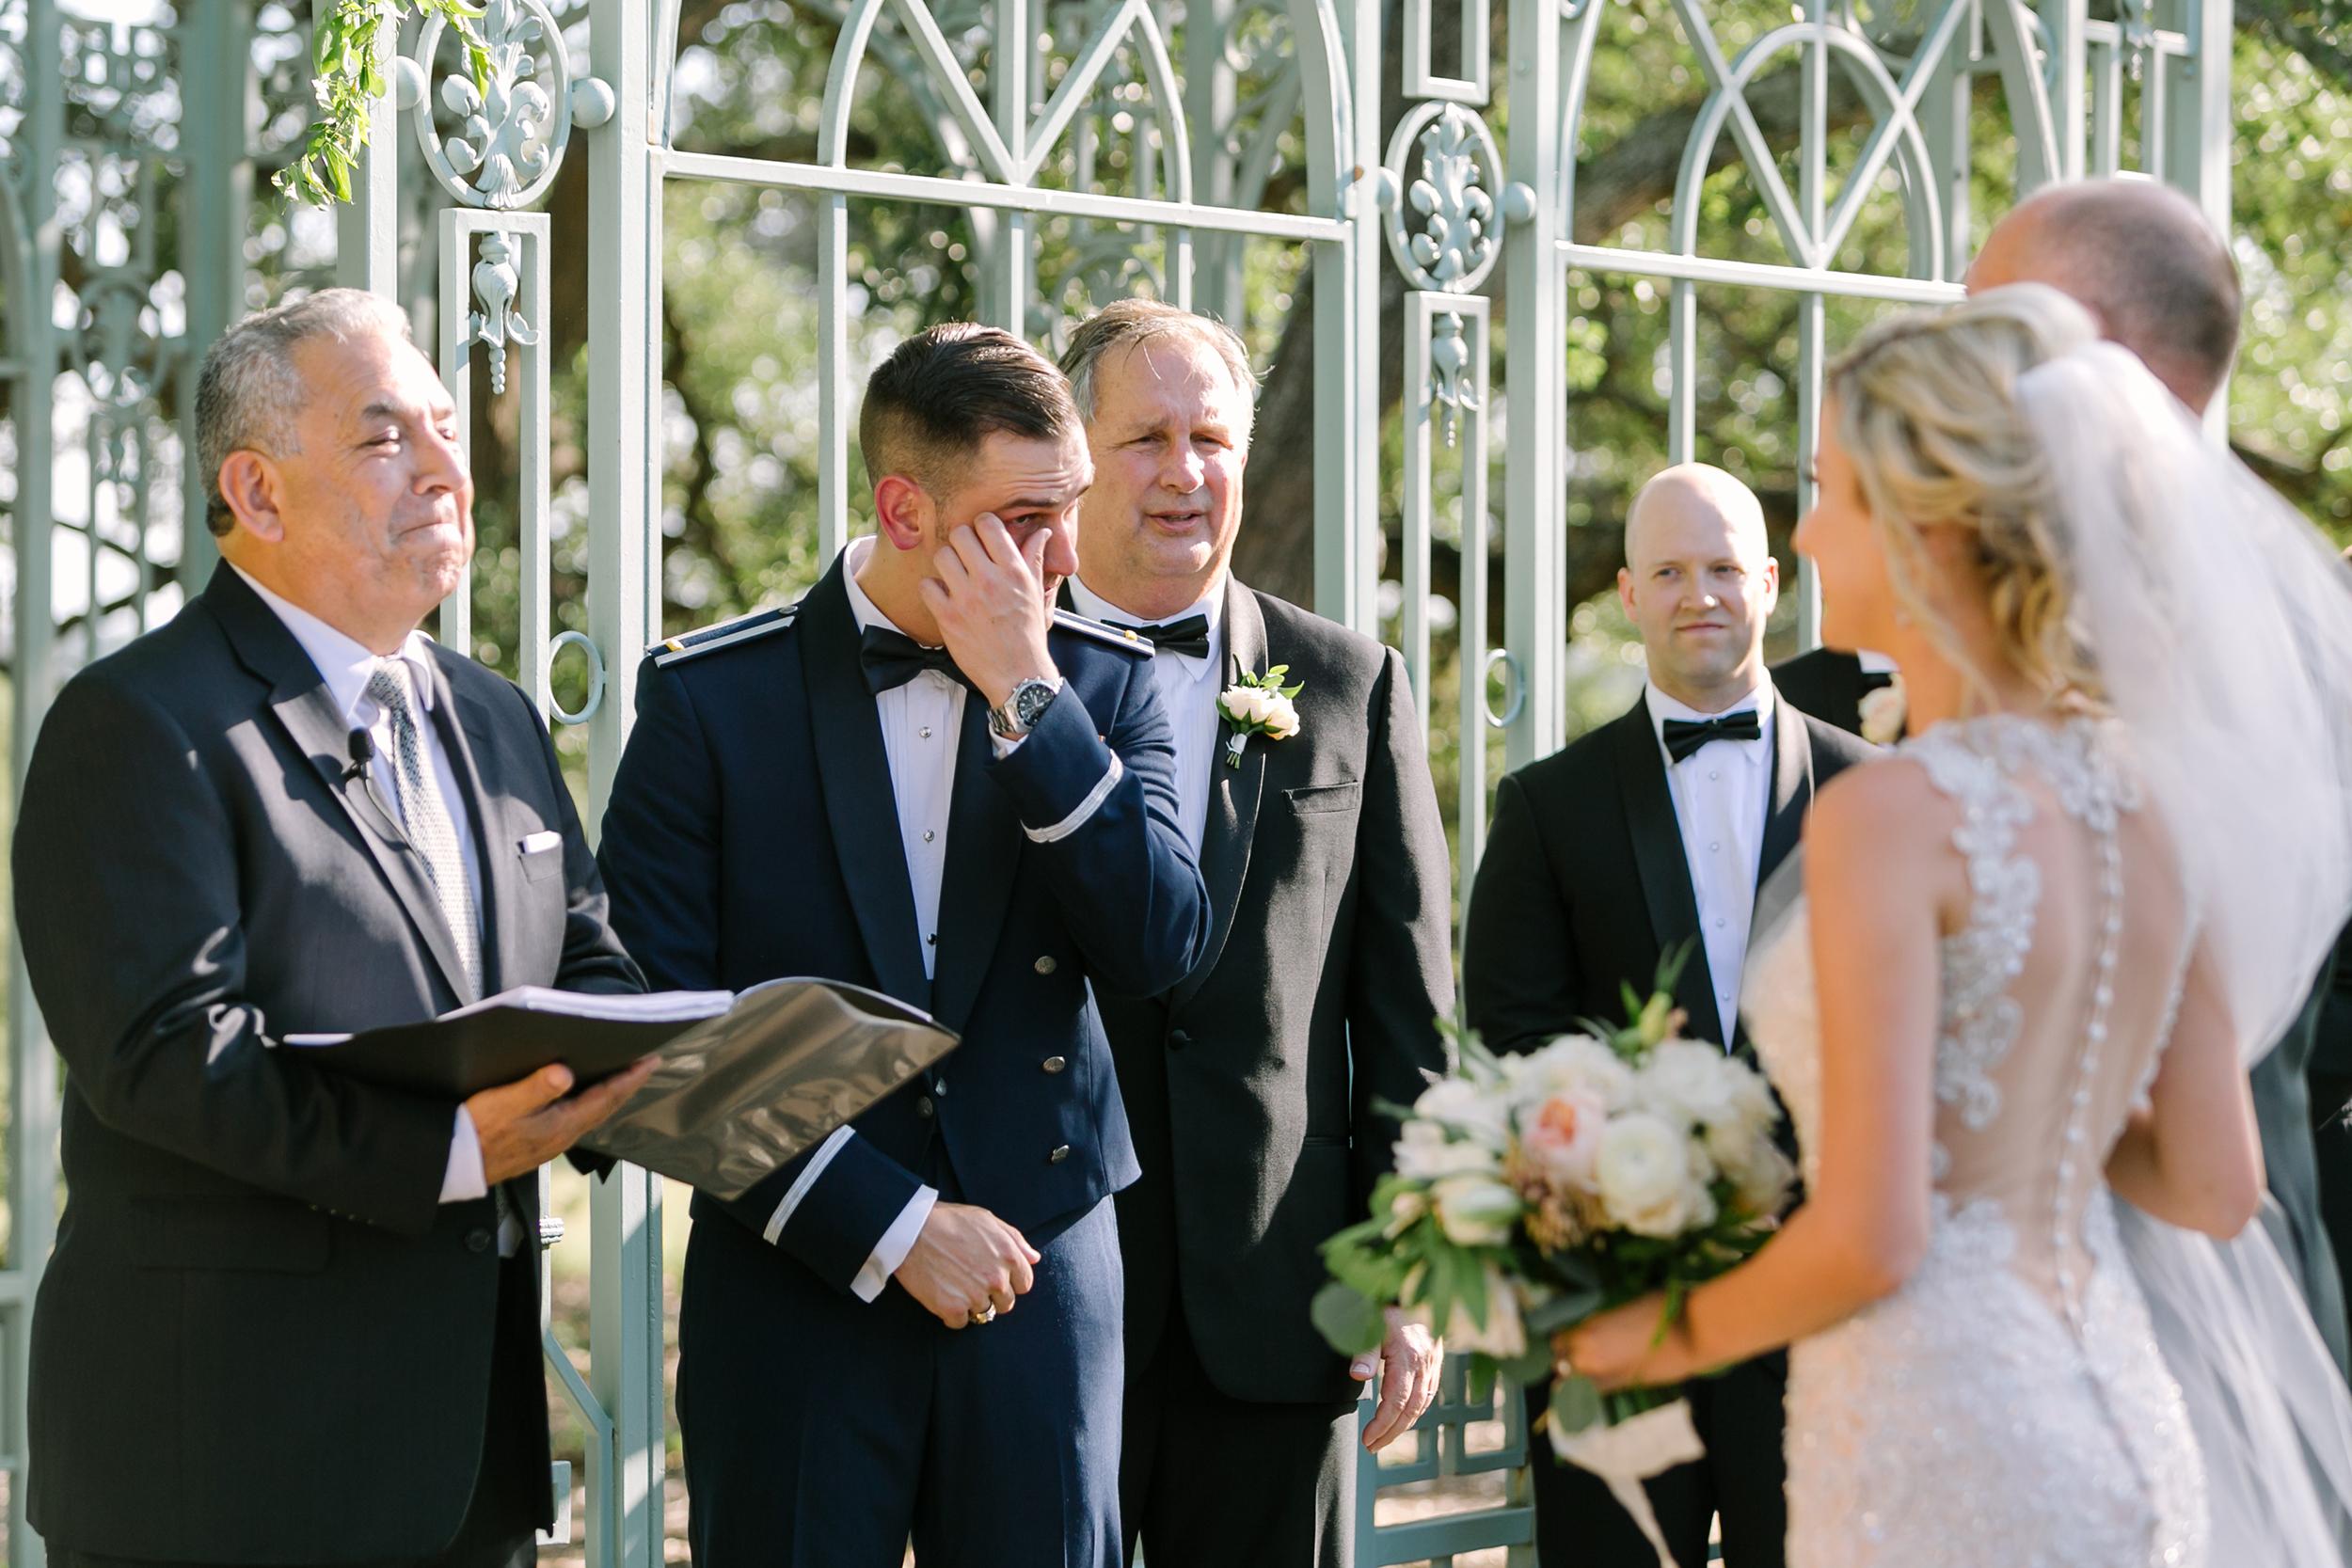 Austin_Wedding_Photographer_Kimberly_Brooke_Photographic_099.jpg